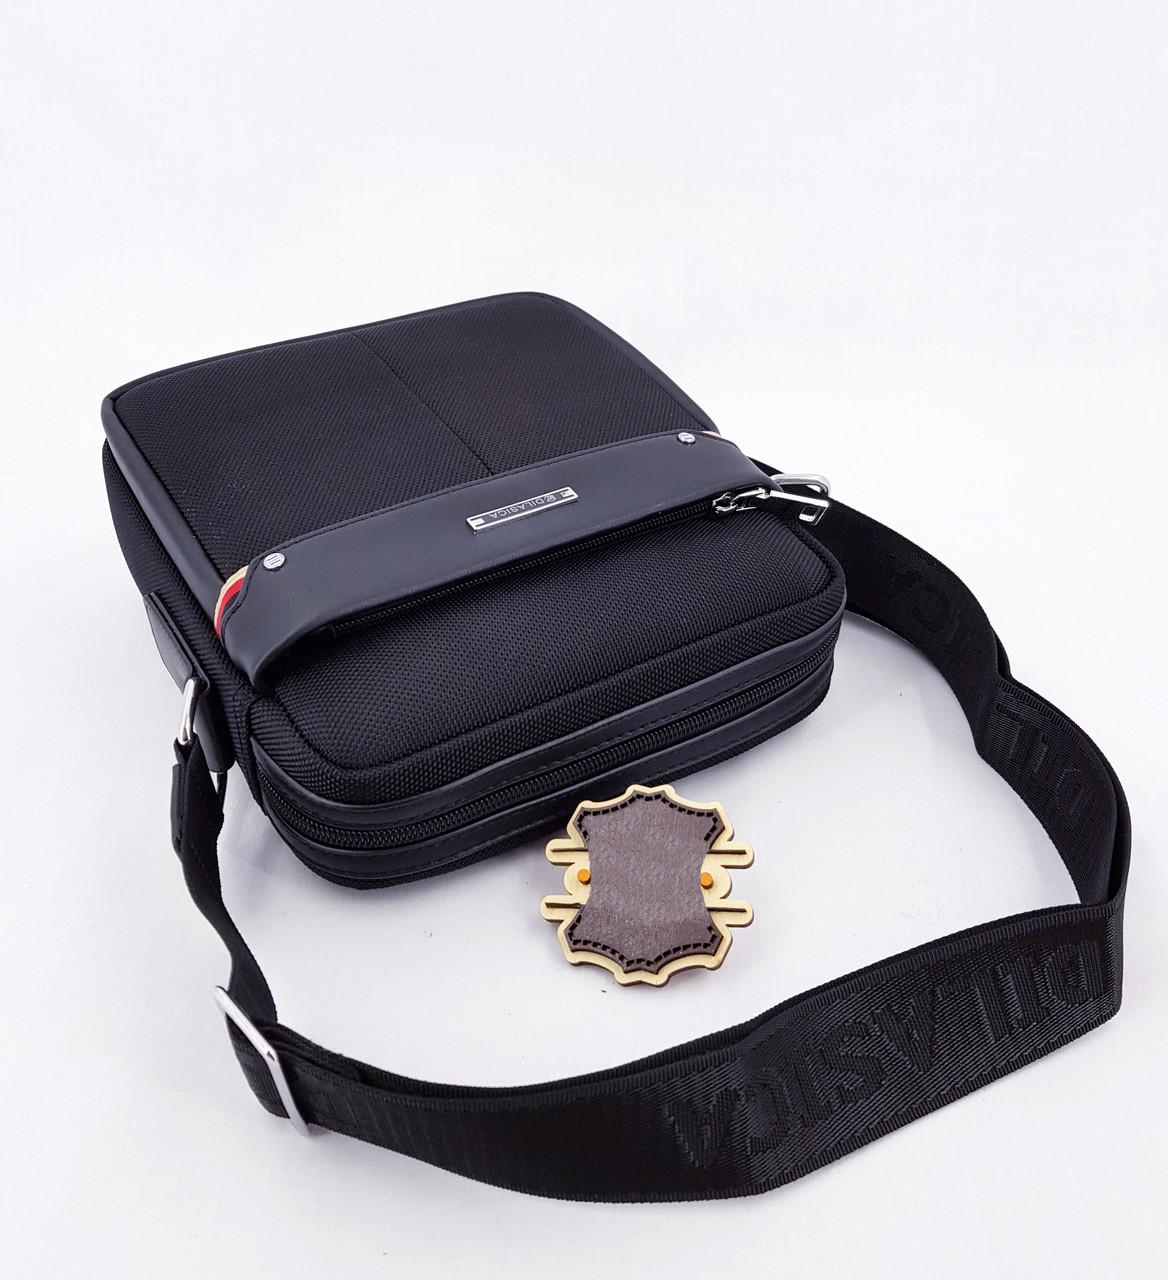 75d286bc6dcb ... Черная Мужская сумка через плечо Dilasica сумка-планшетка новинка, ...